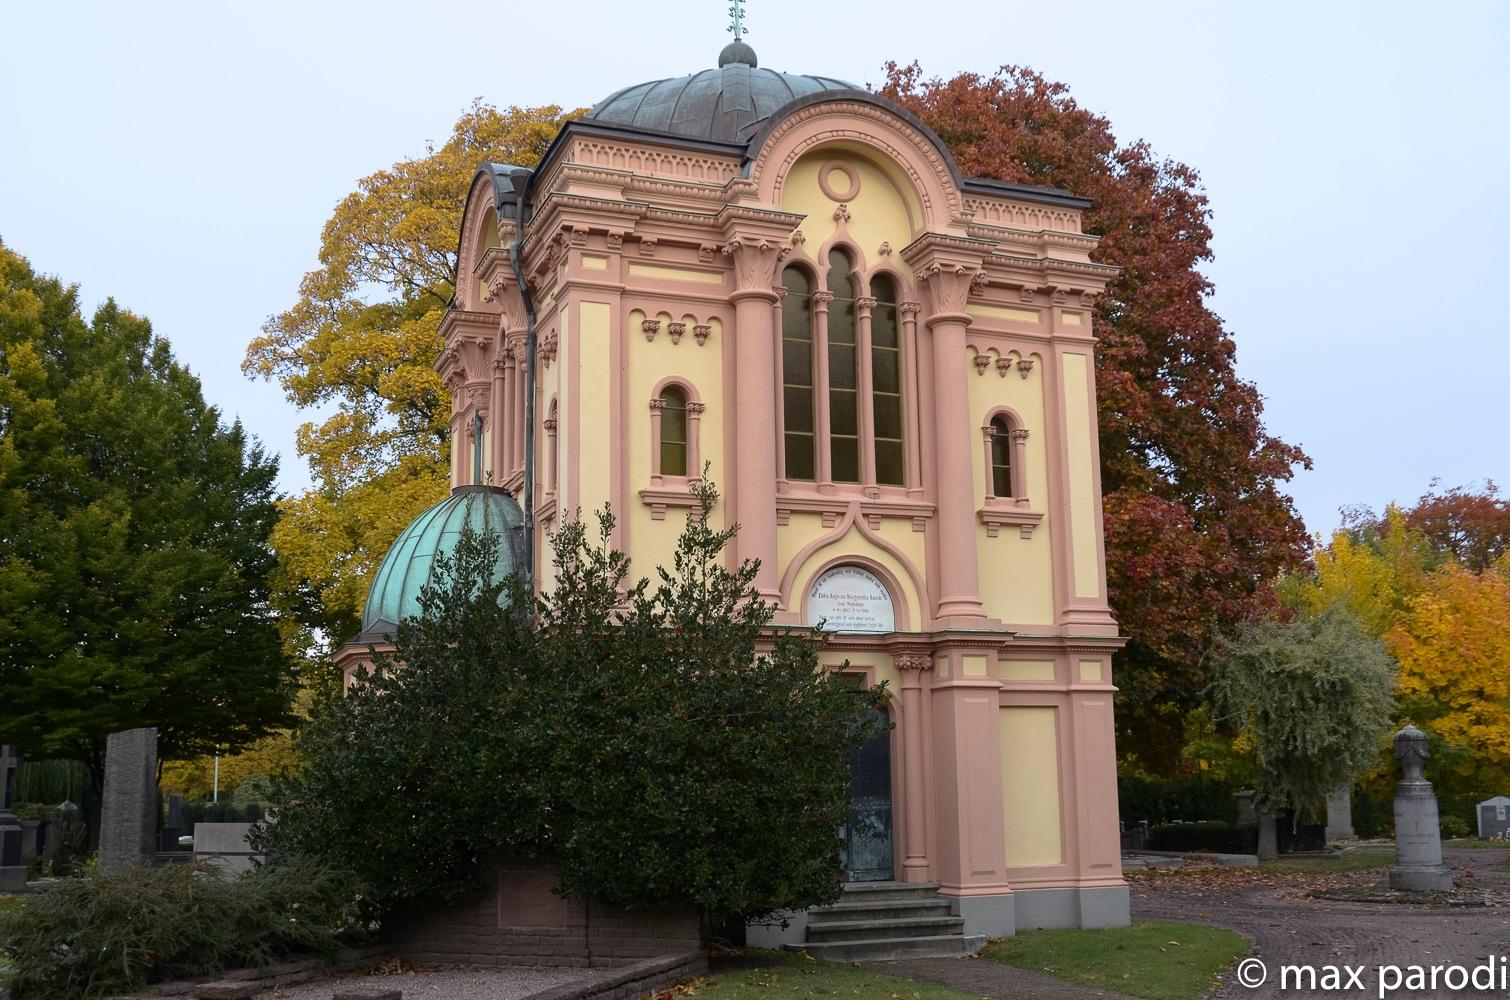 Mausoleum, by Max Cesare Parodi